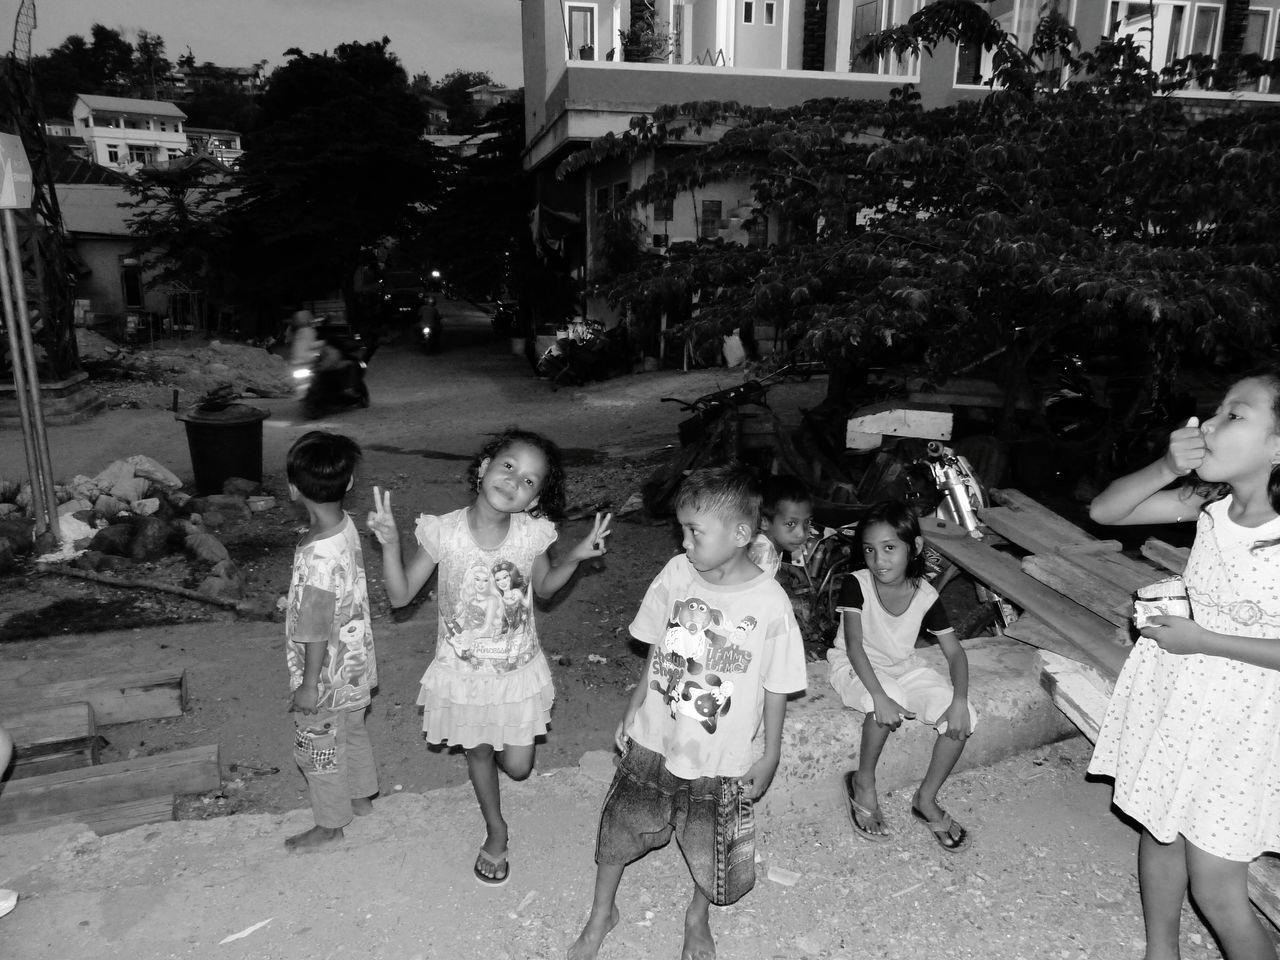 Child Childhood Medium Group Of People Togetherness People Kids Playing Happiness Blackandwhite Friendship Domestic Life INDONESIA Floresisland Labuanbajo